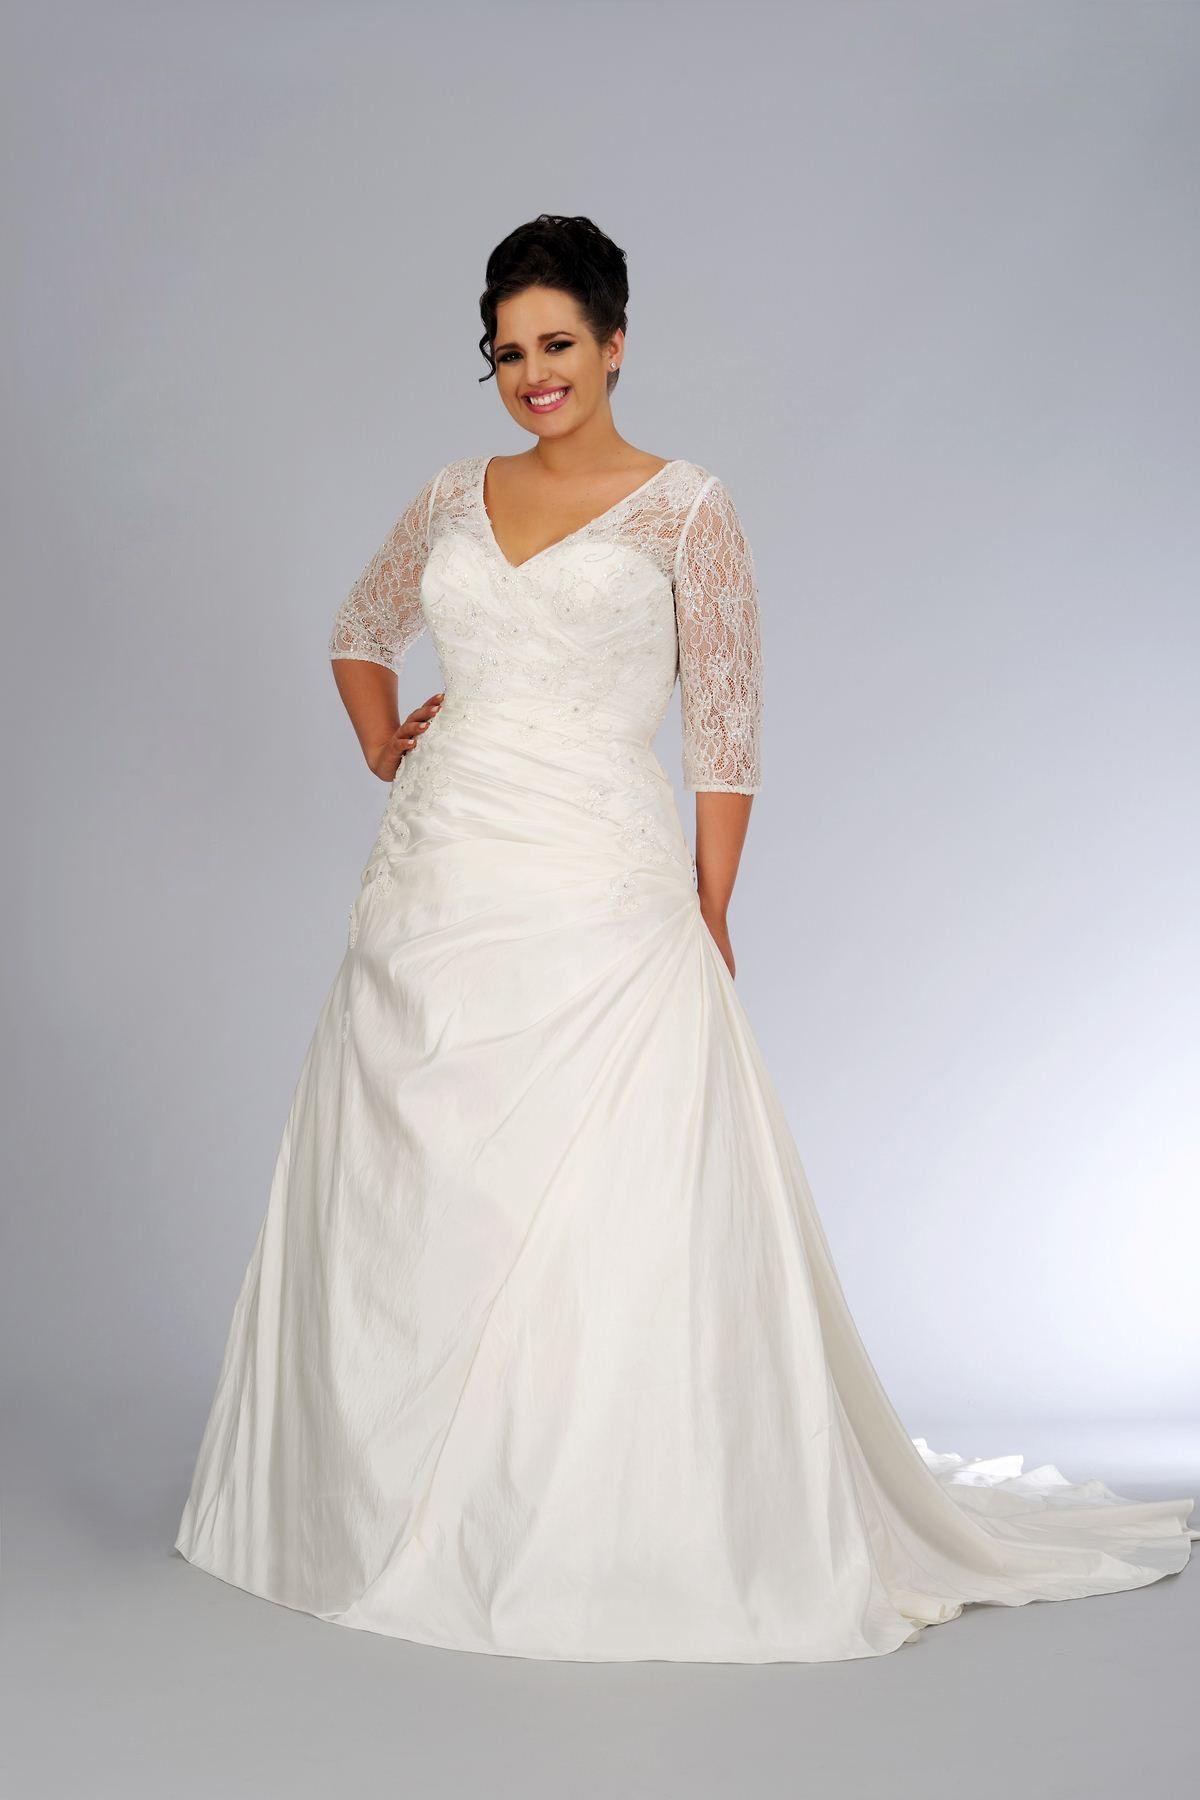 Shop Beautiful Plus Size Wedding Dresses A Line V Neck Court Train Satin Online Affordable For Big Discount